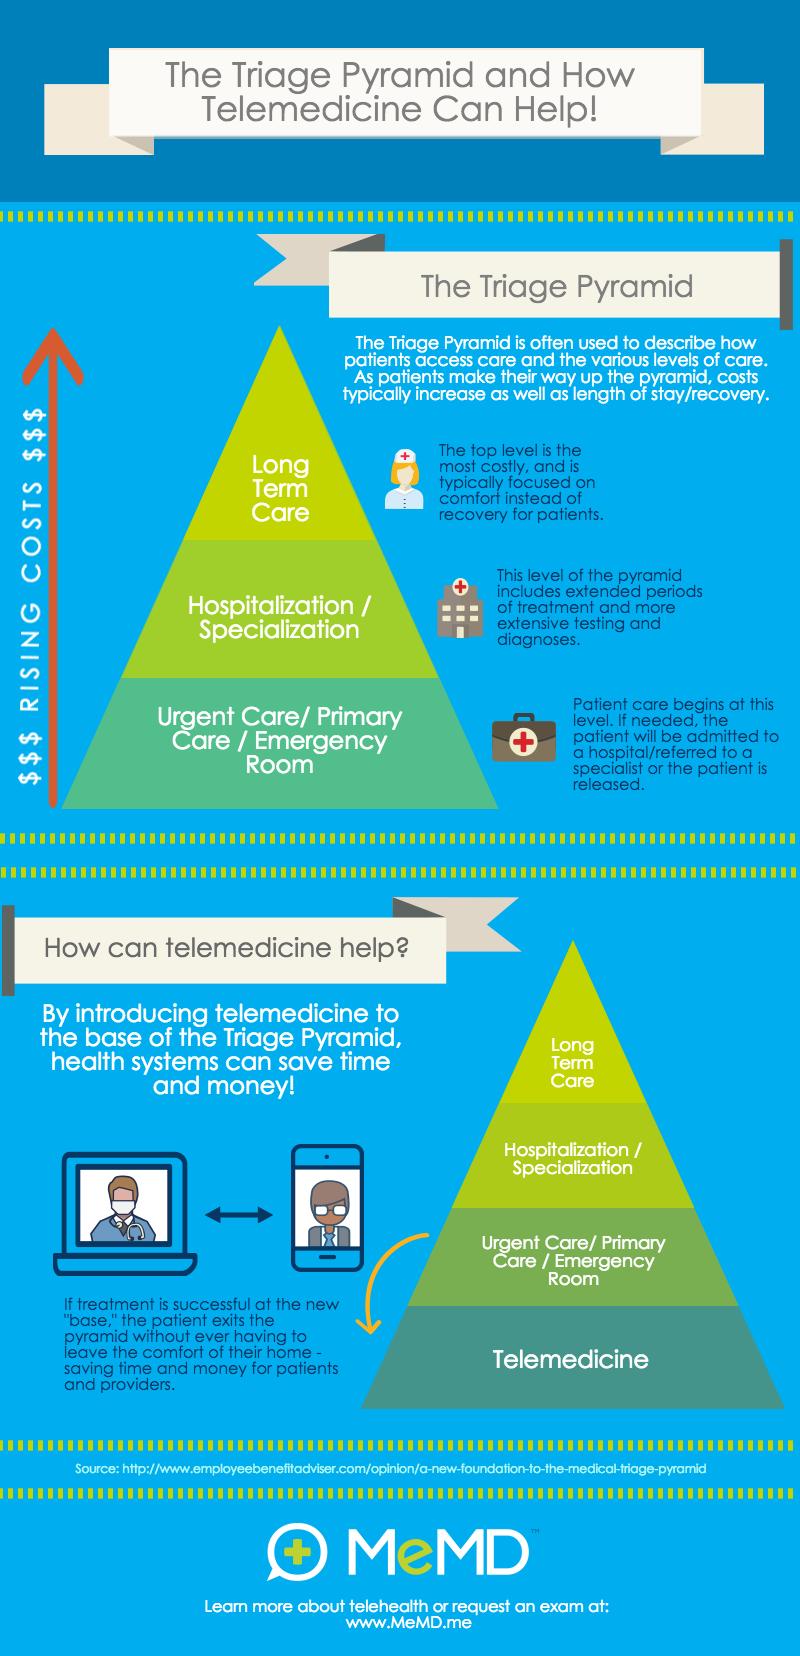 blog-memd-infographic-triage-pyramid-telehealth